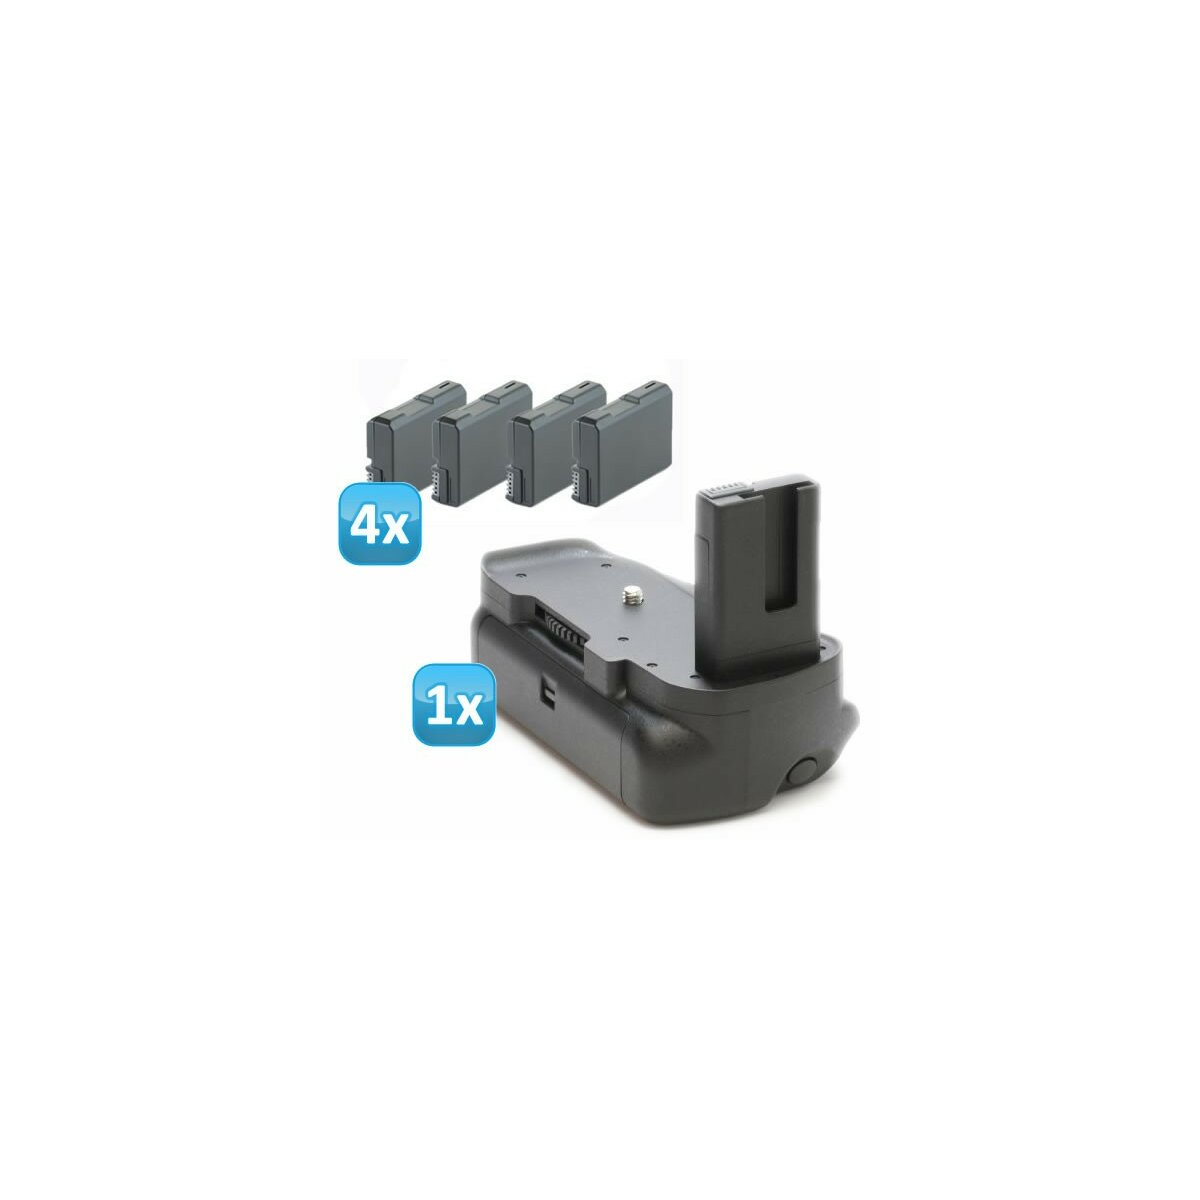 Minadax Profi Batteriegriff kompatibel mit Nikon D5300, D5200, D5100 inklusiv 4x EN-EL14 Nachbau-Akkus - hochwertiger Handgriff mit Hochformatauslöser